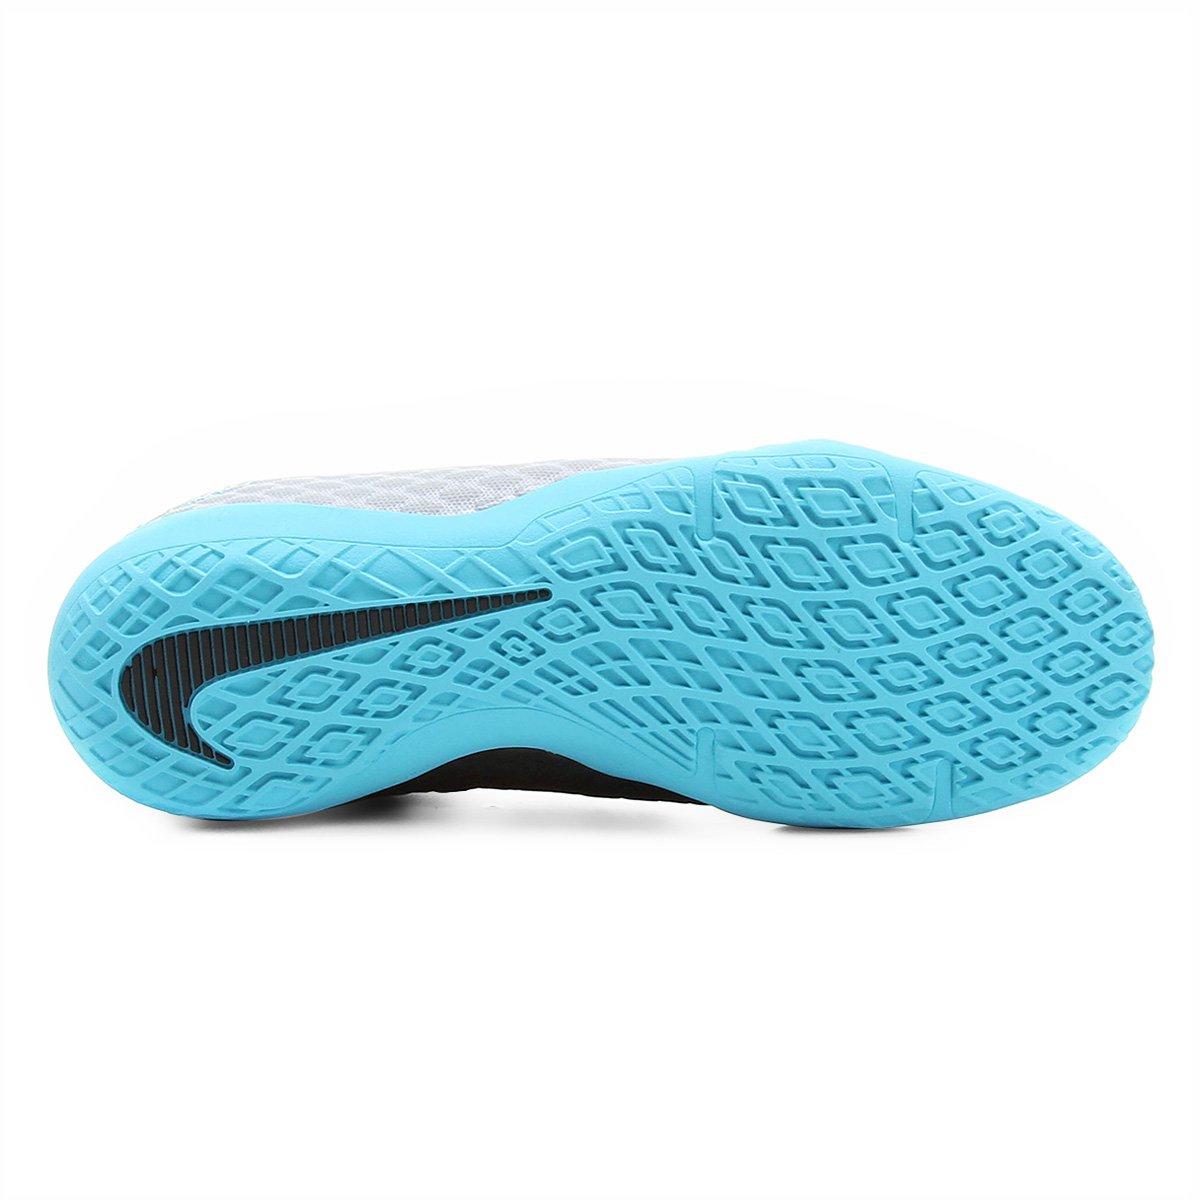 b2821533ef Chuteira Futsal Nike Hypervenom Phelon 3 IC - Compre Agora